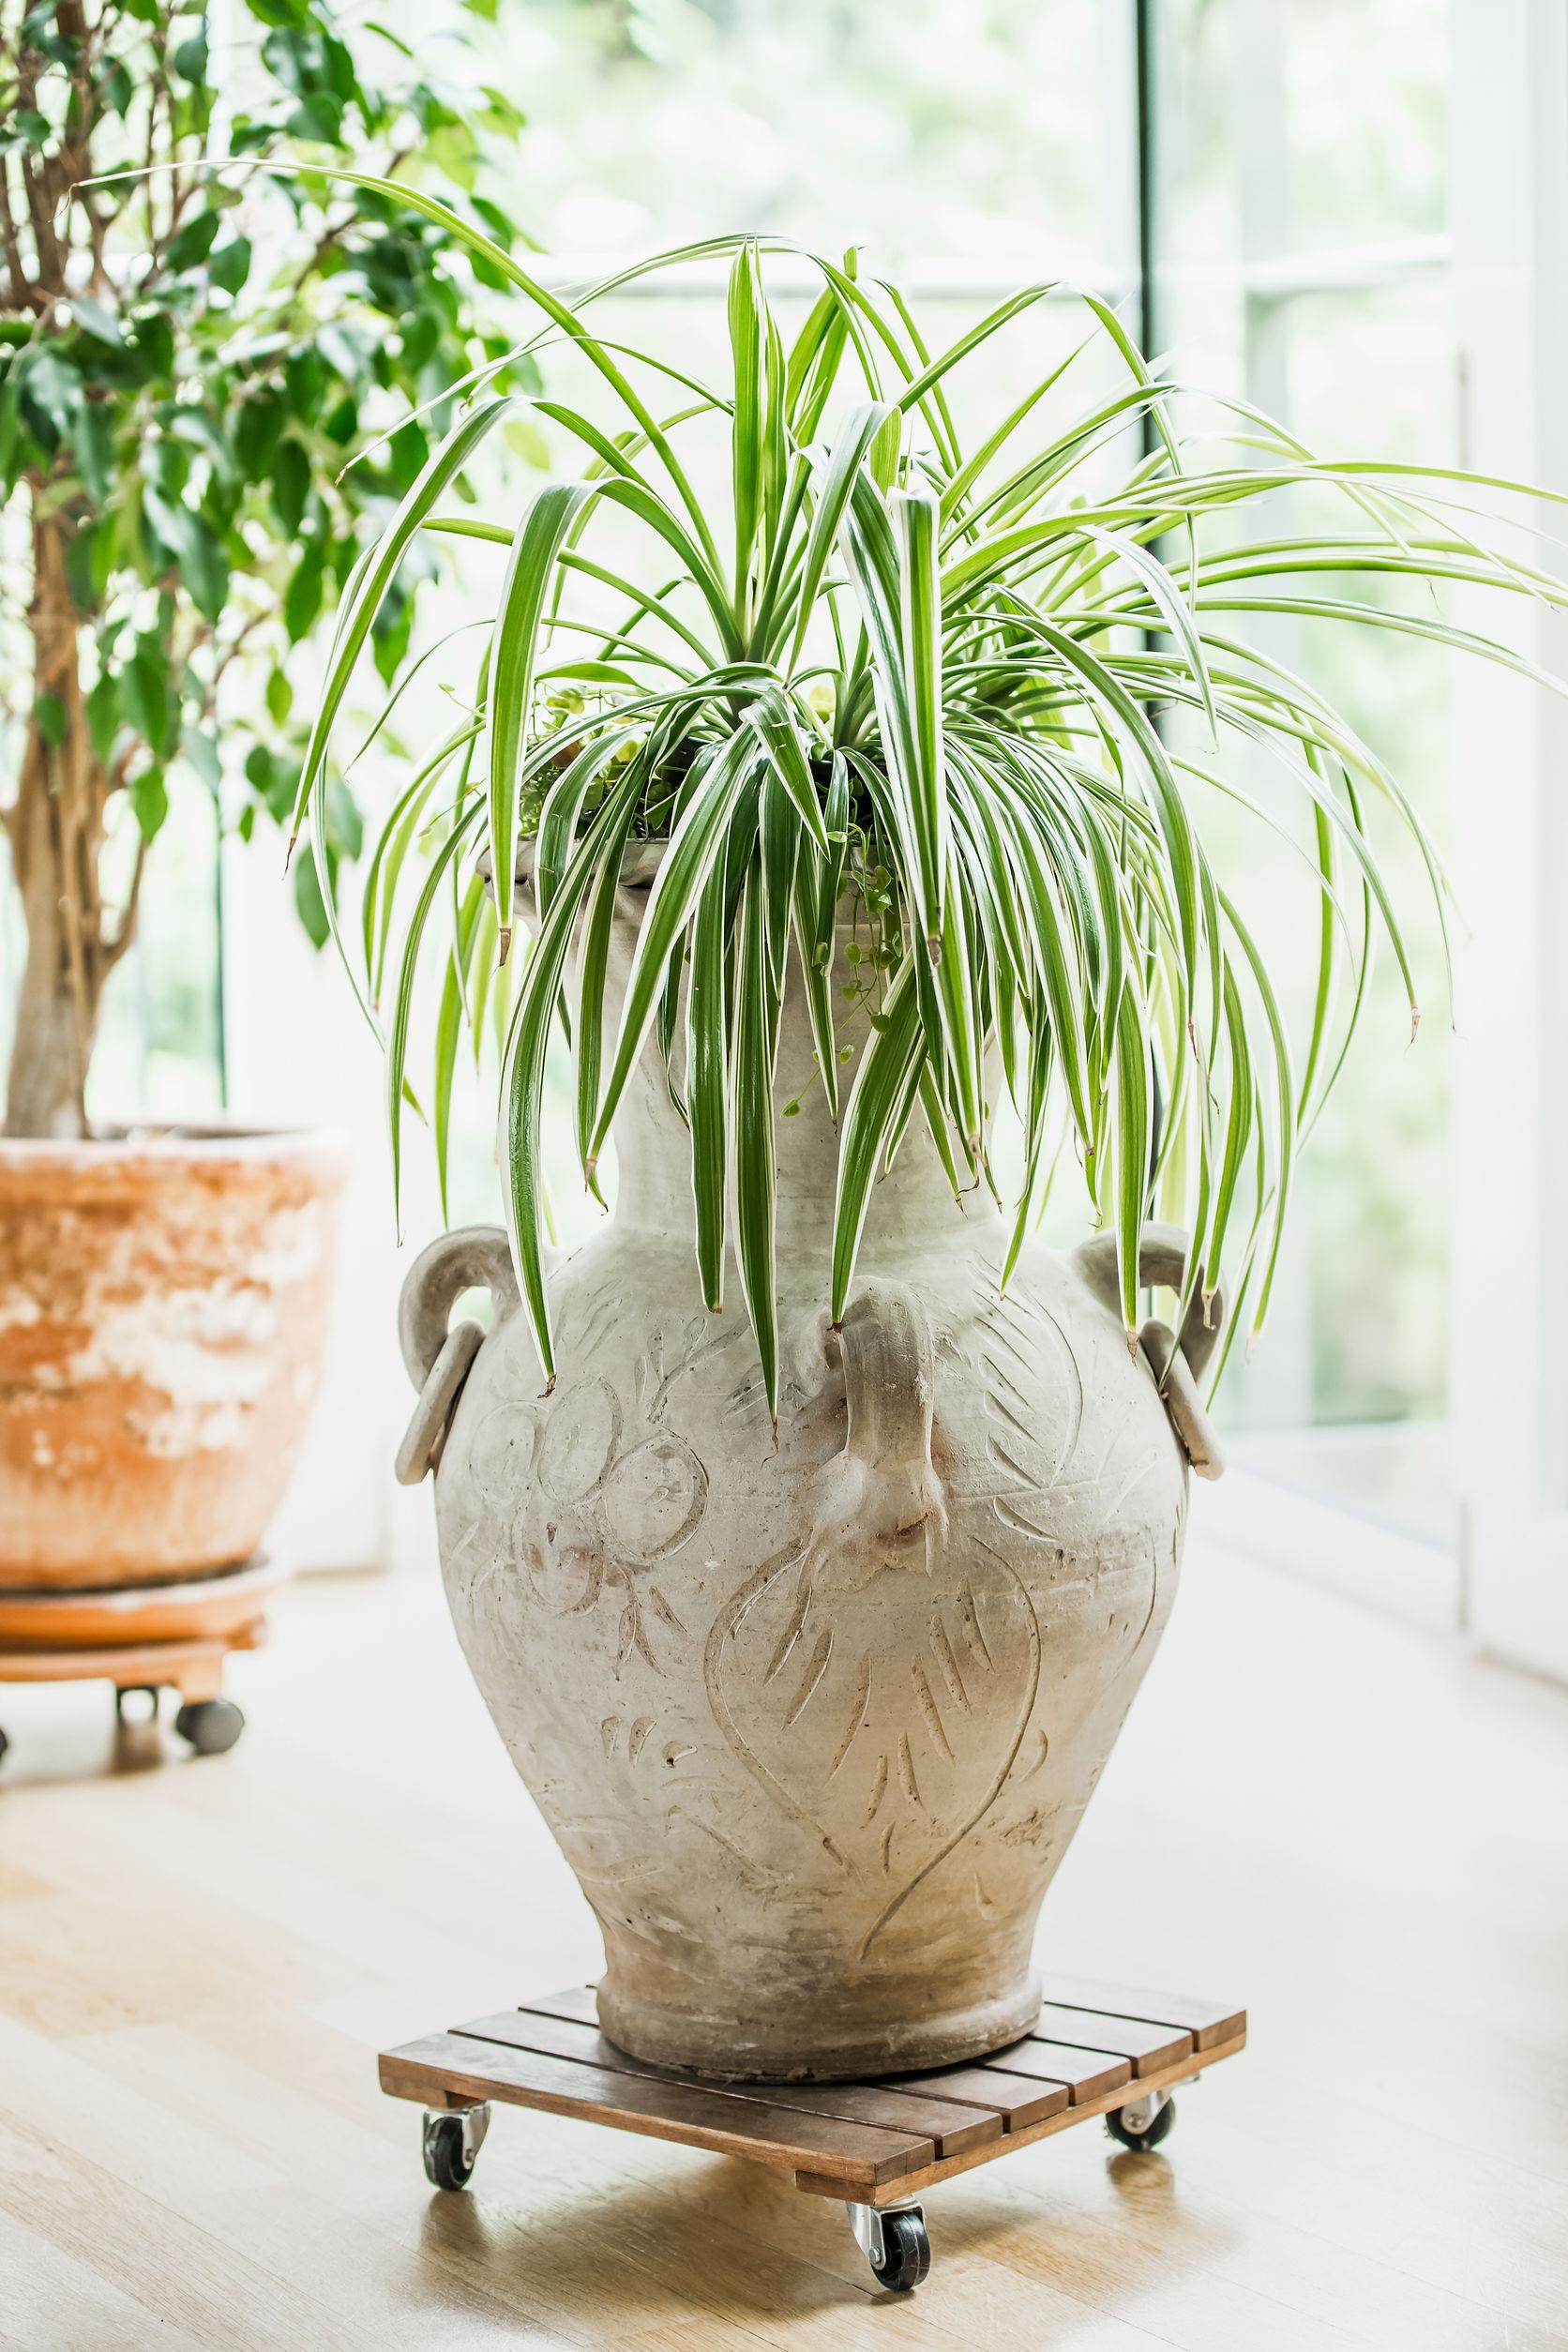 The Spider Plant (Chlorophytum Comosum) requires little sunlight to survive.